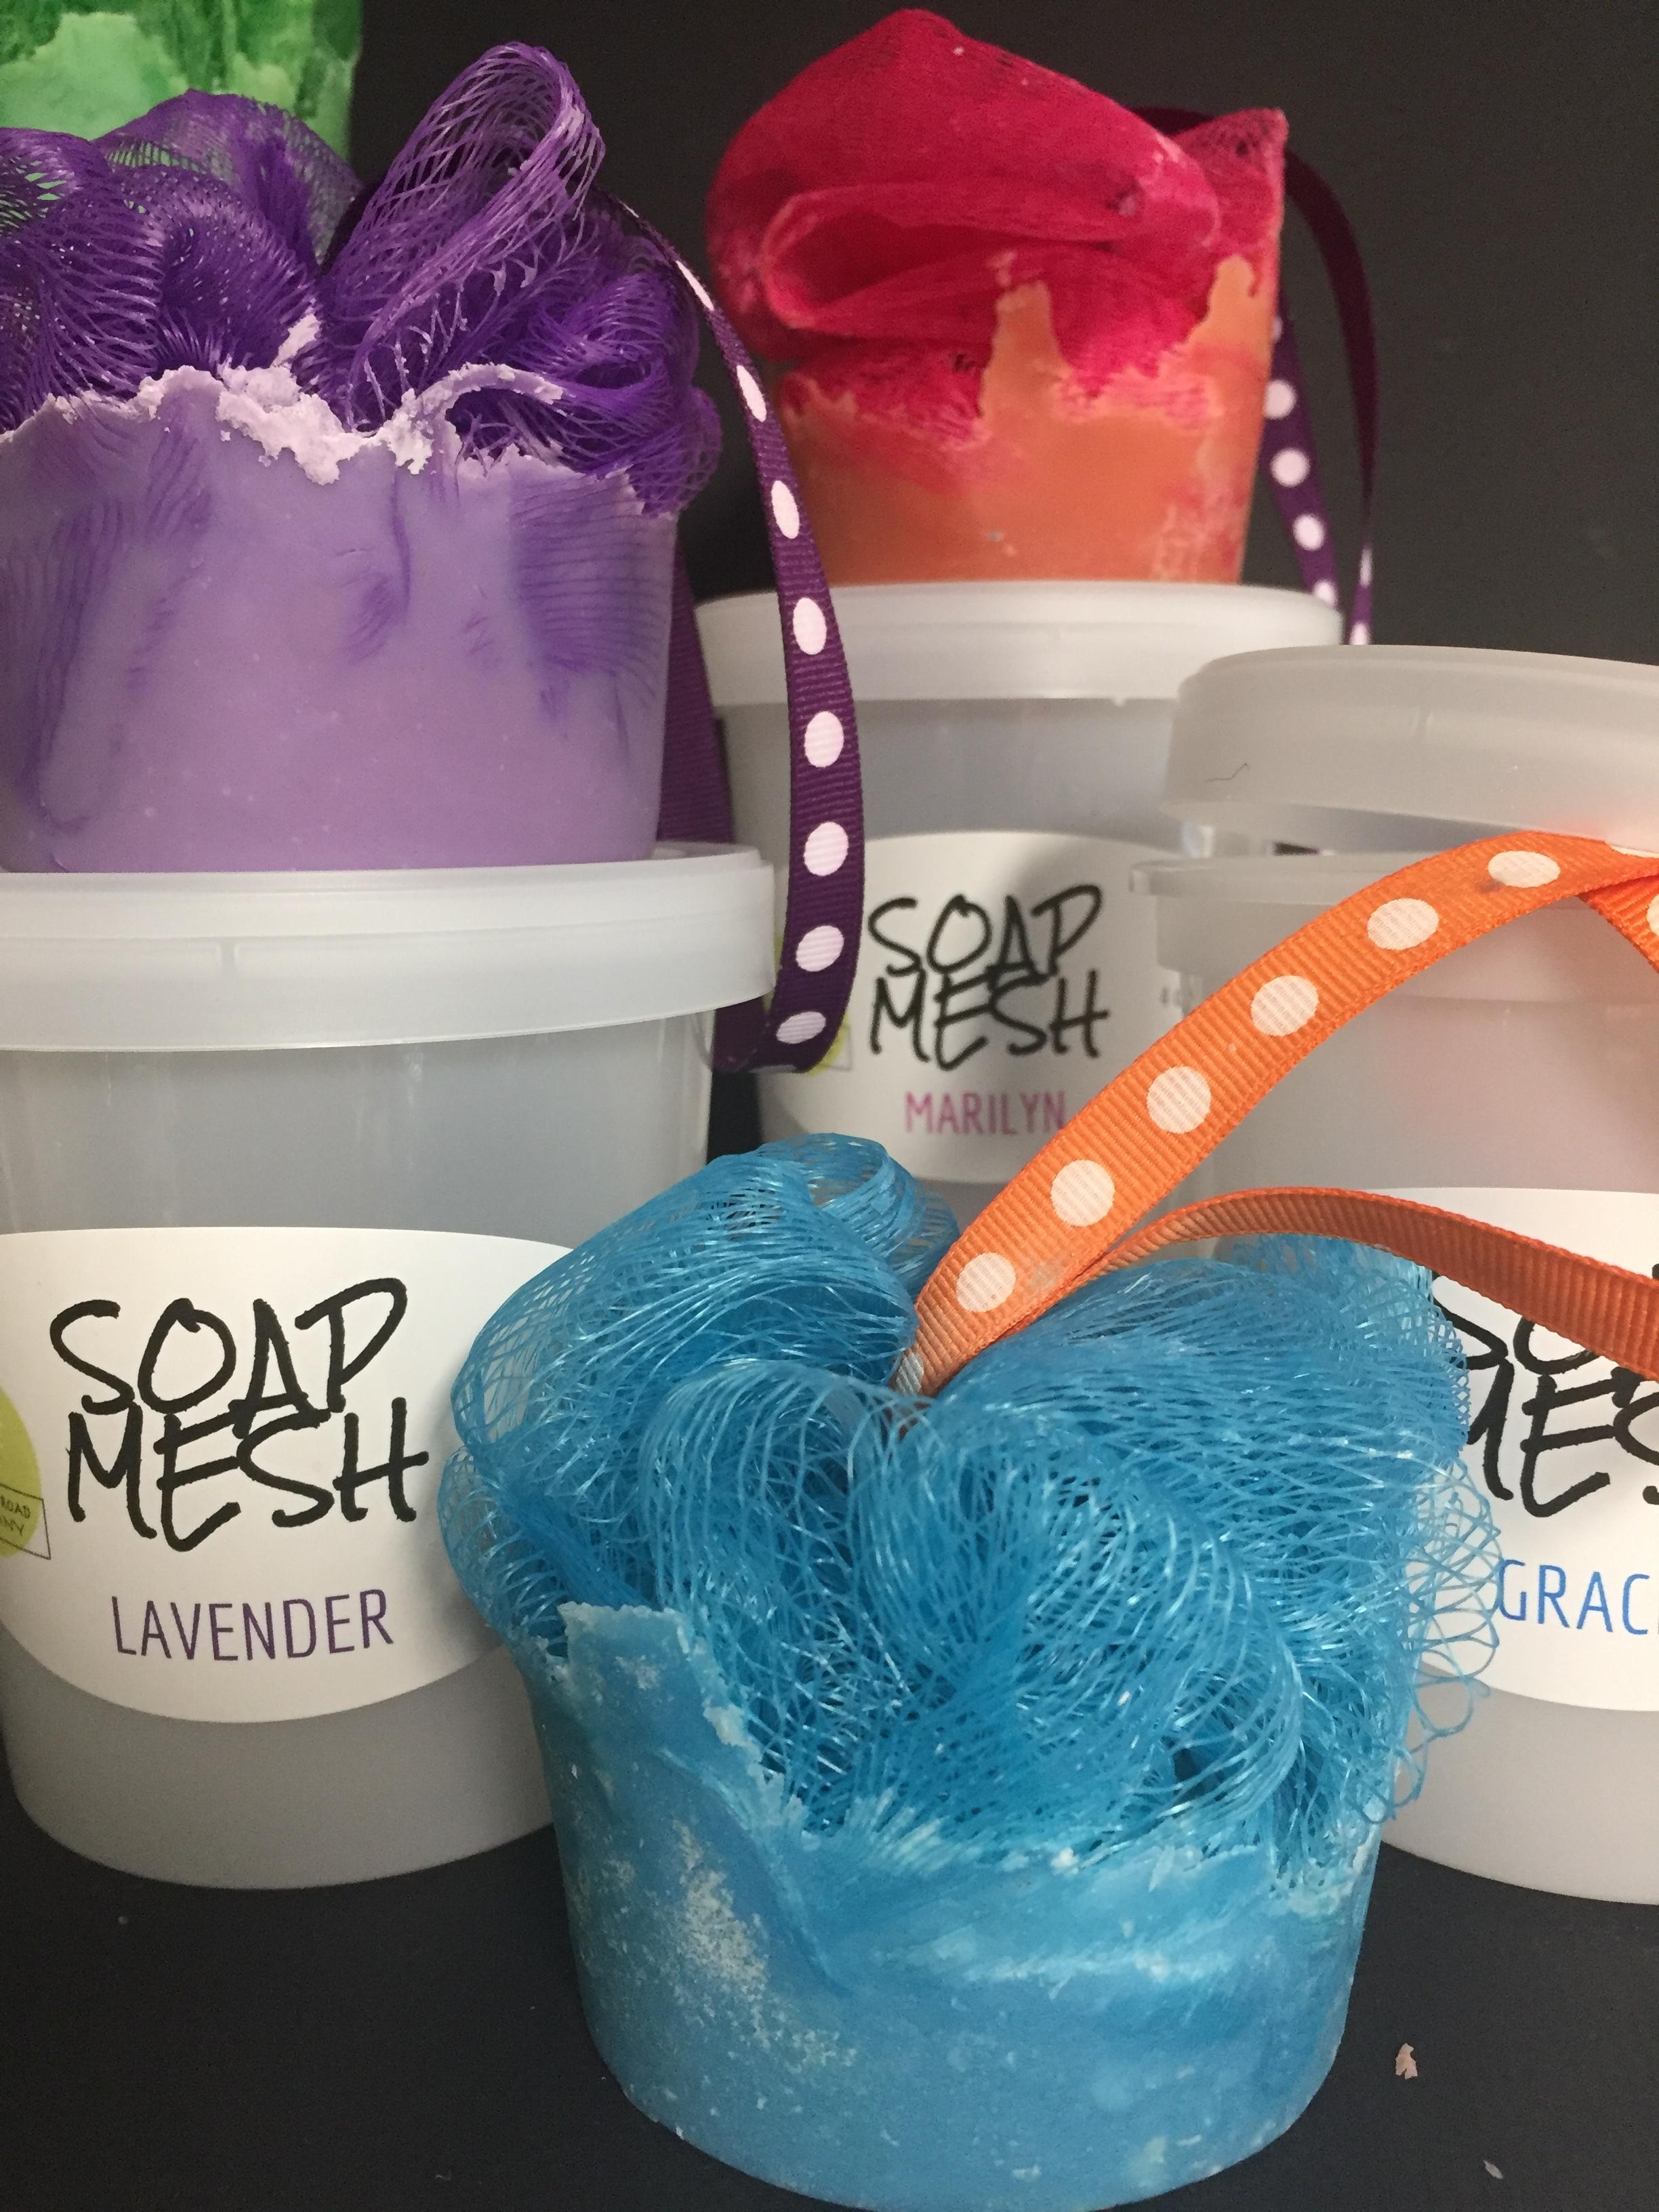 SOAP MESH